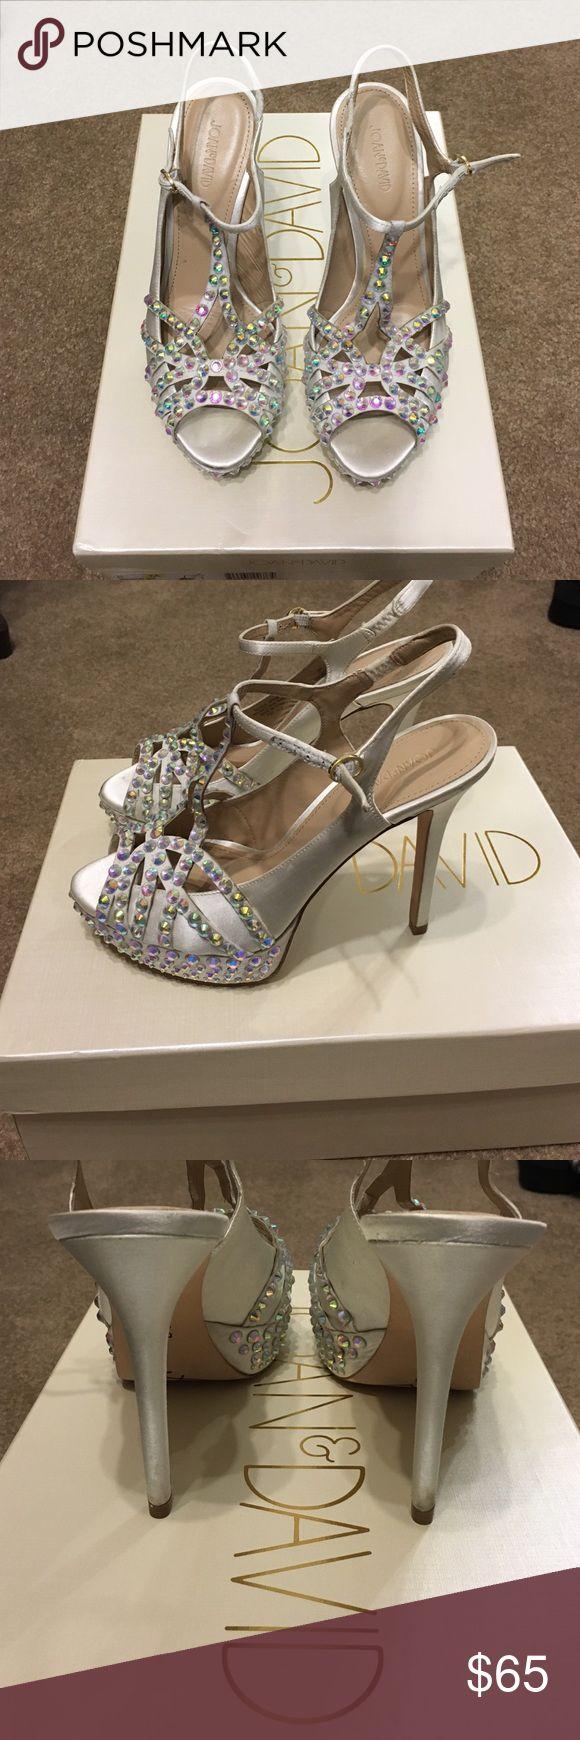 White satin crystal heels Joan & David white satin heels with Rhine stone embellishment Joan & David Shoes Heels